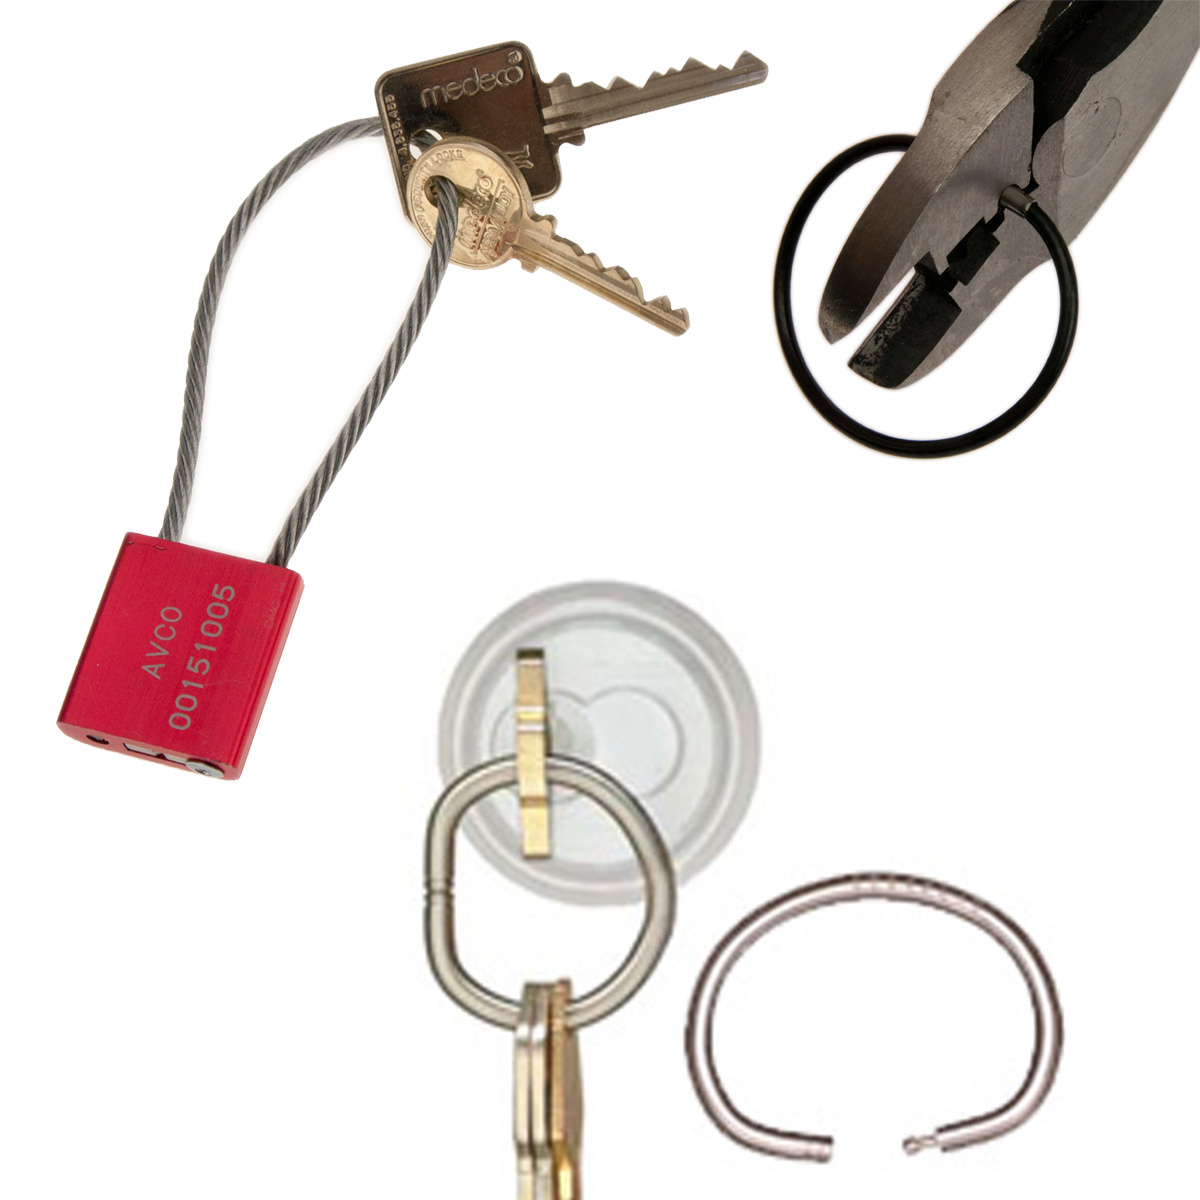 Tamper proof and tamper resistant key rings